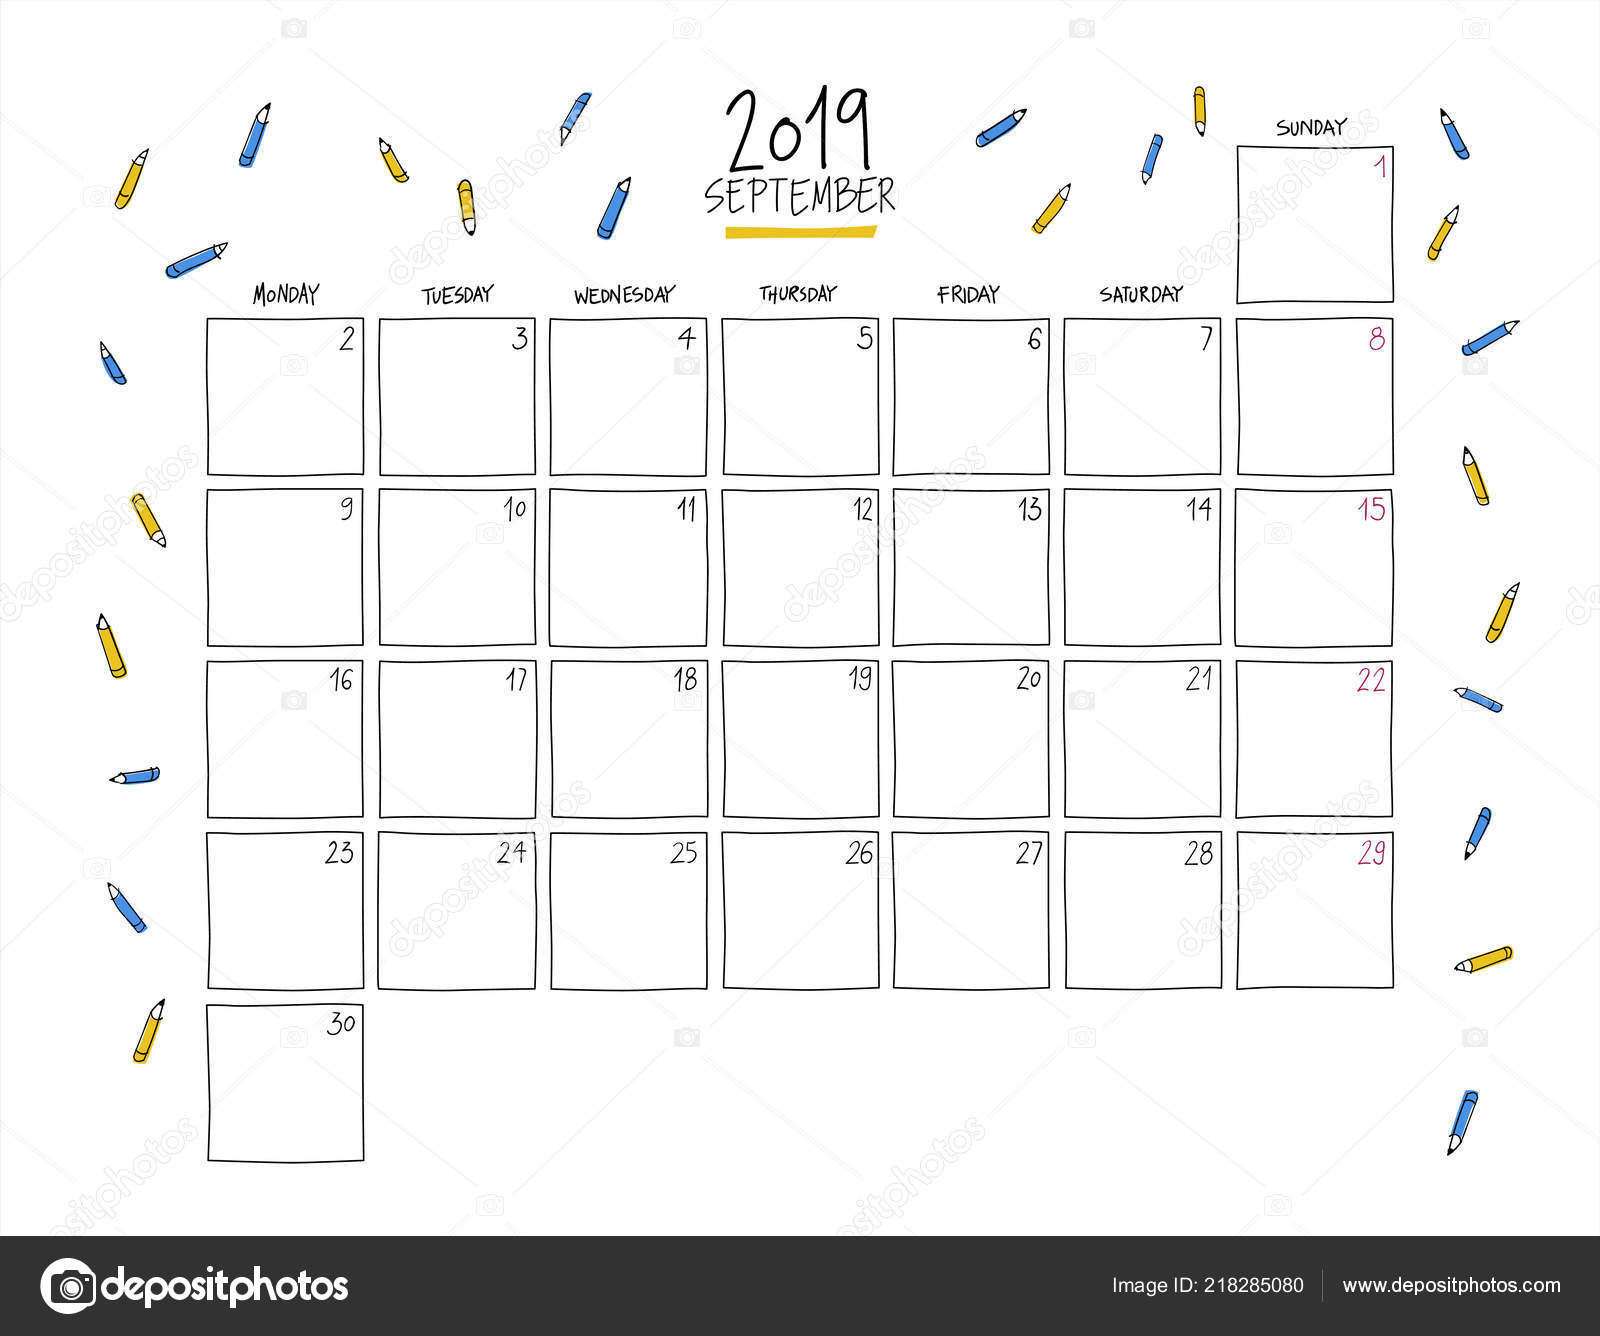 Calendario De Septiembre 2019 Para Imprimir Animado.Calendario Pared Septiembre 2019 Plantilla Horizontal Dibujo